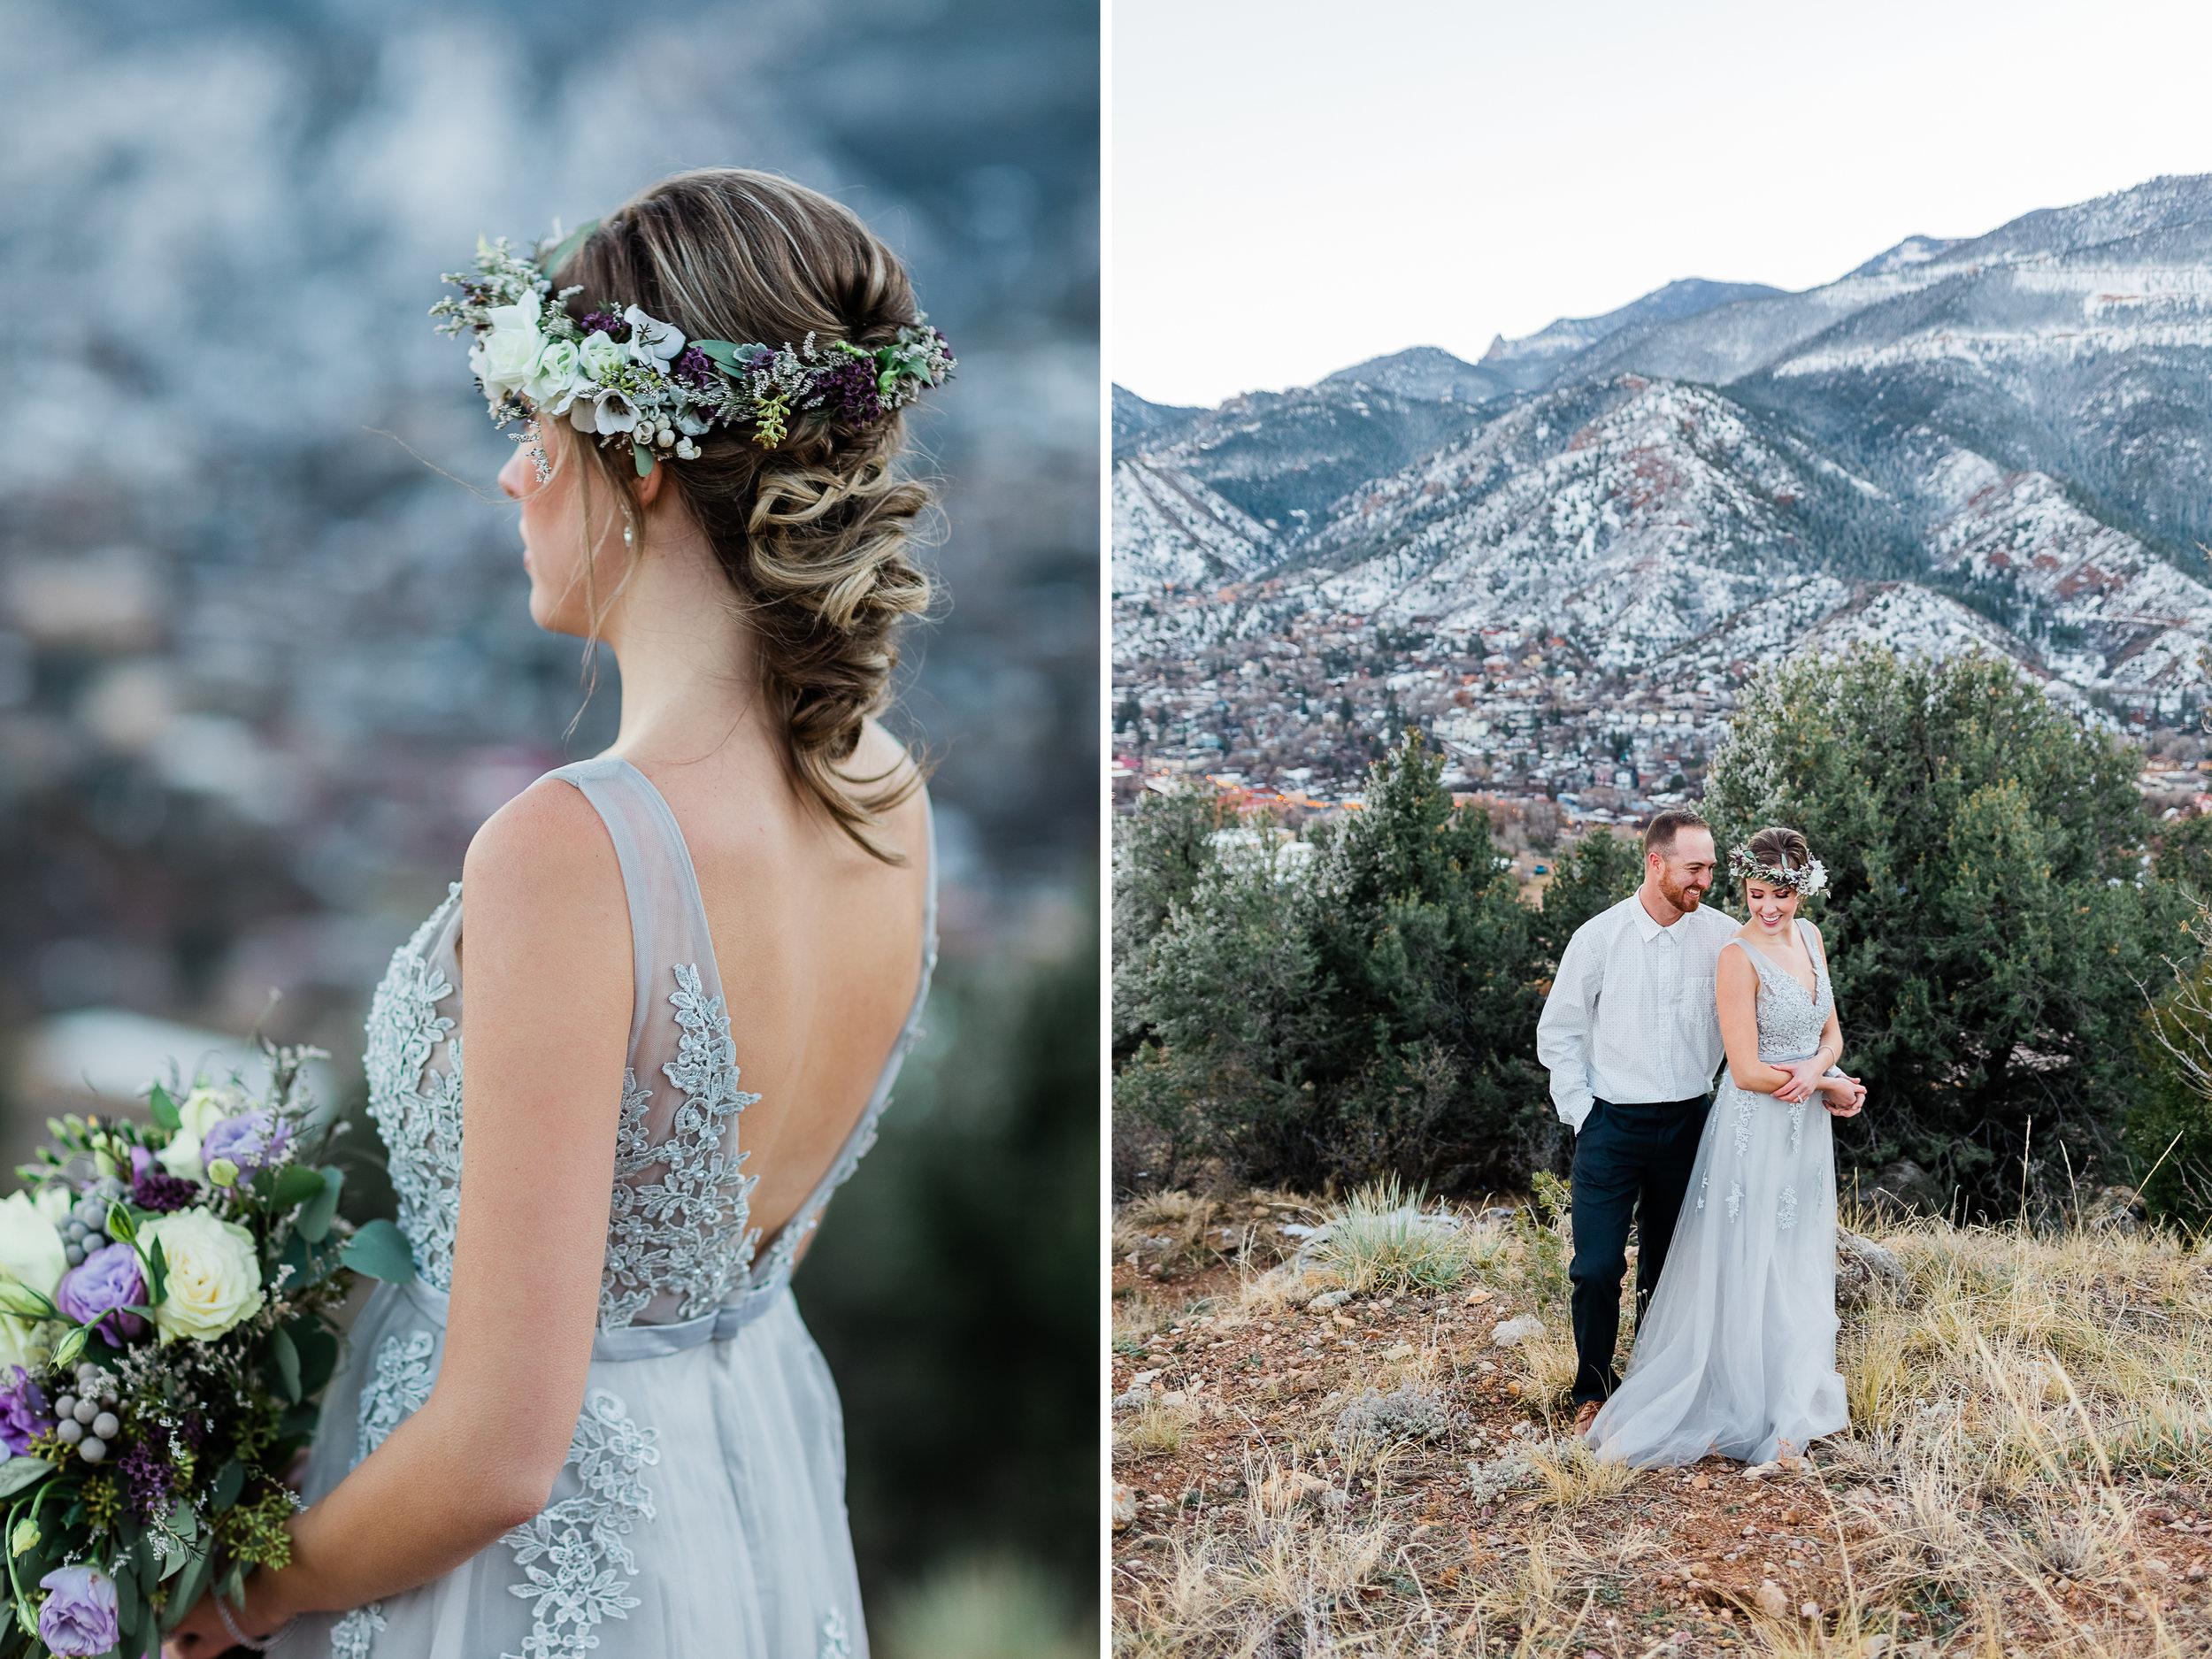 Colorado Springs Wedding Photographer 6.jpg